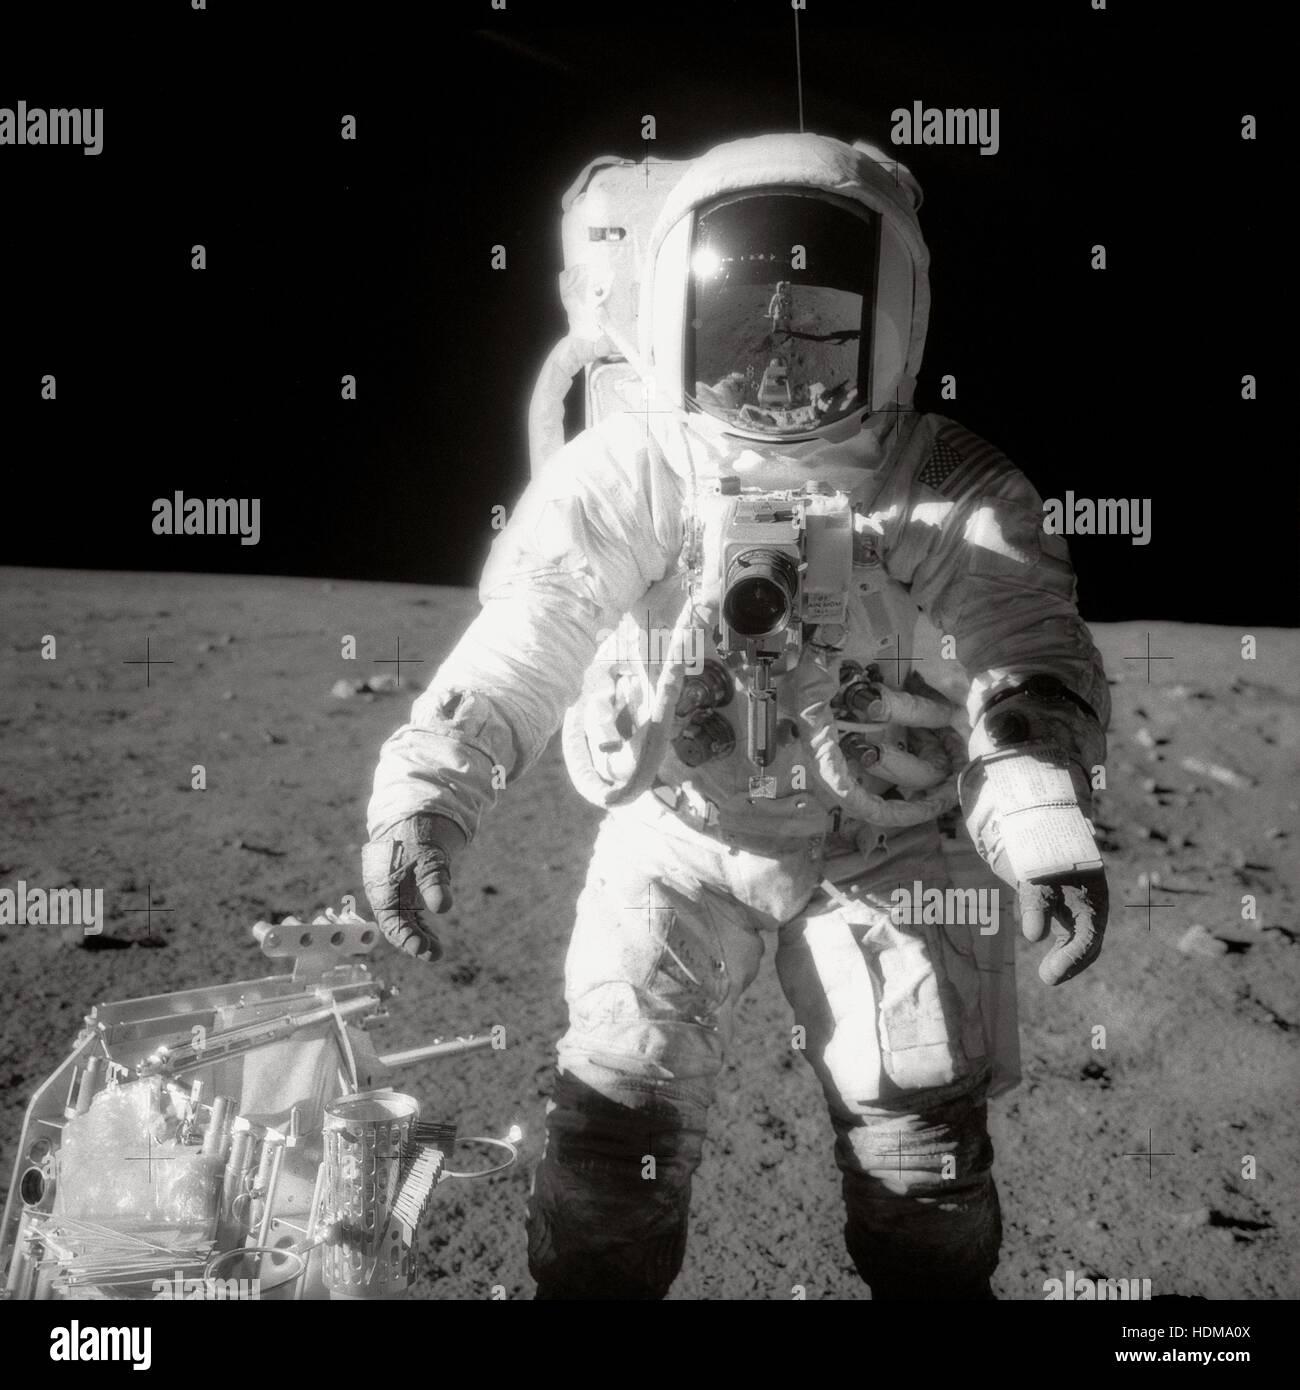 NASA Apollo 12 lunar landing mission astronaut Alan Bean pauses near a tool carrier during an EVA spacewalk November - Stock Image